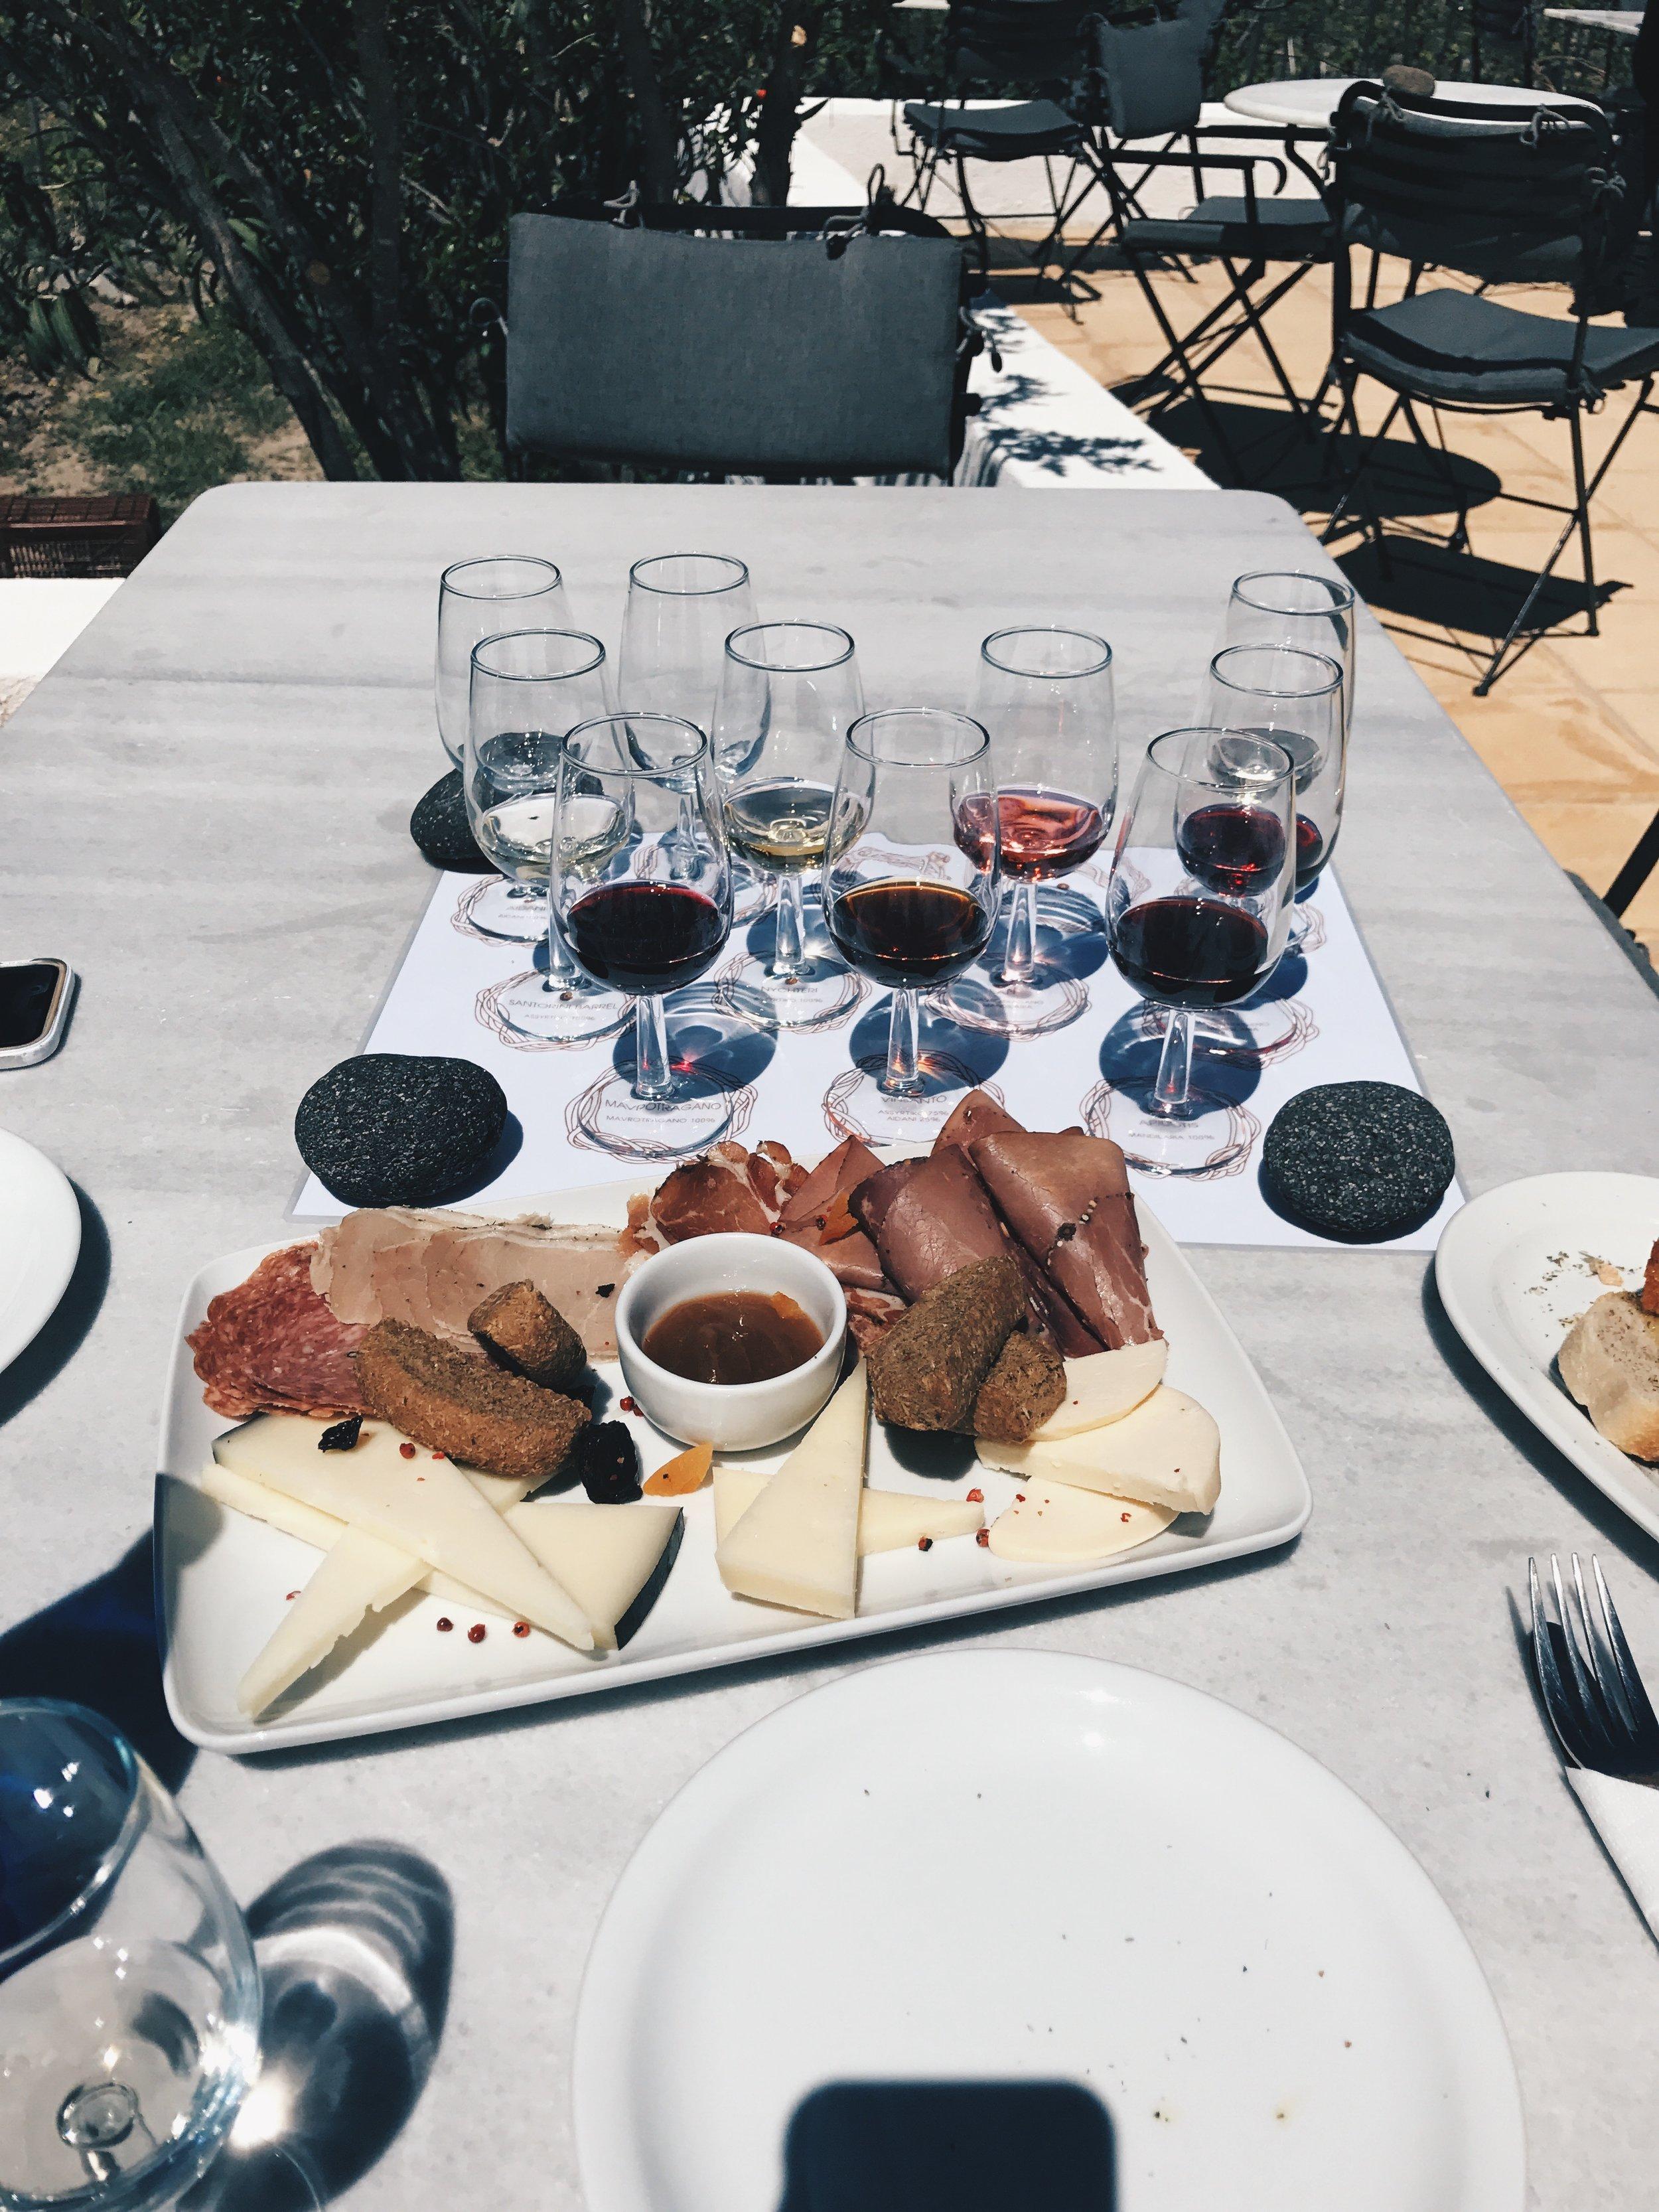 cheese, charcuterie, & wine - heaven.